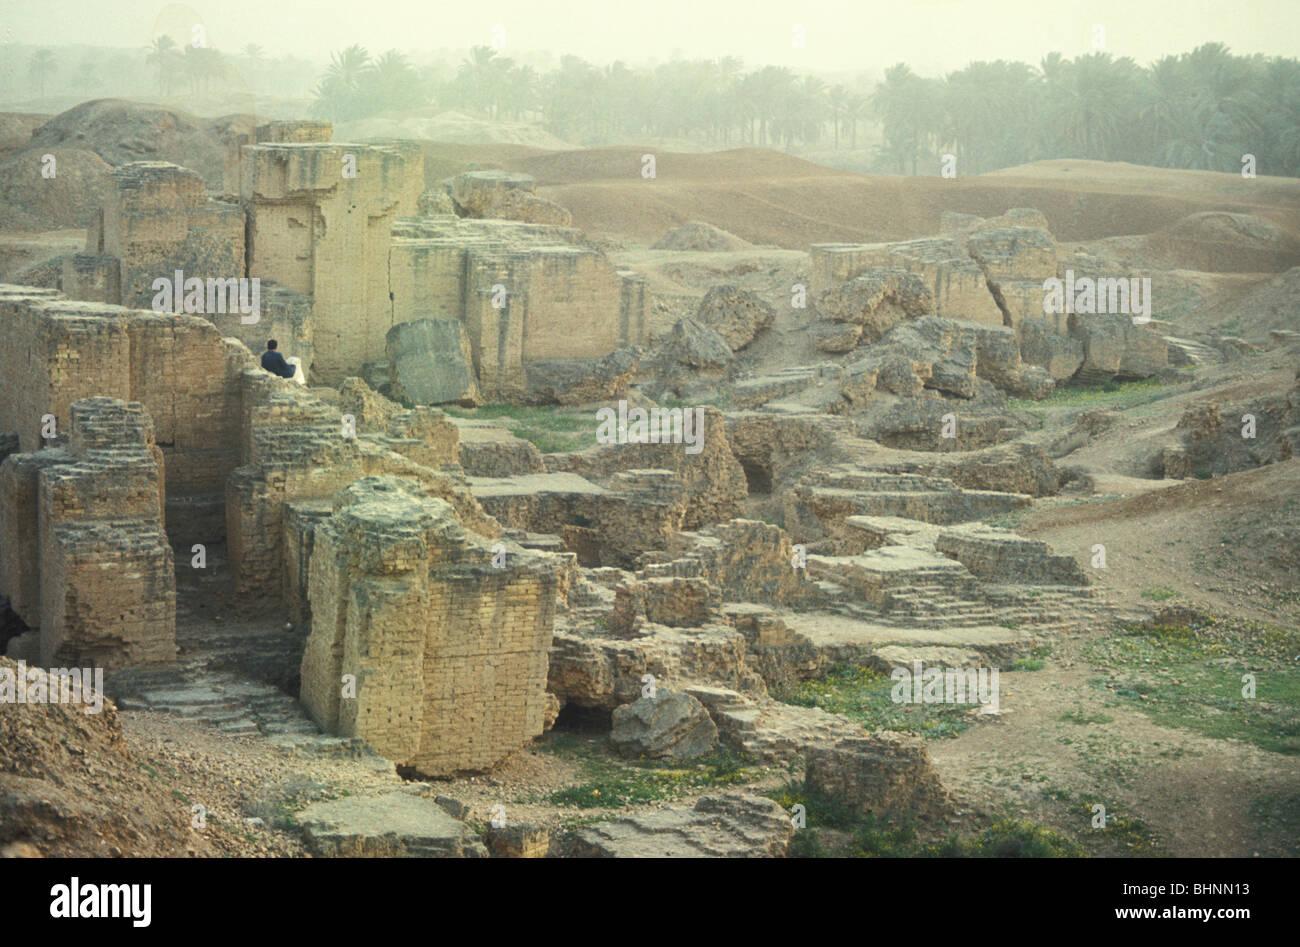 Ancient mud brick ruins of Babylon Mesopotamia Hilla Iraq Stock Photo